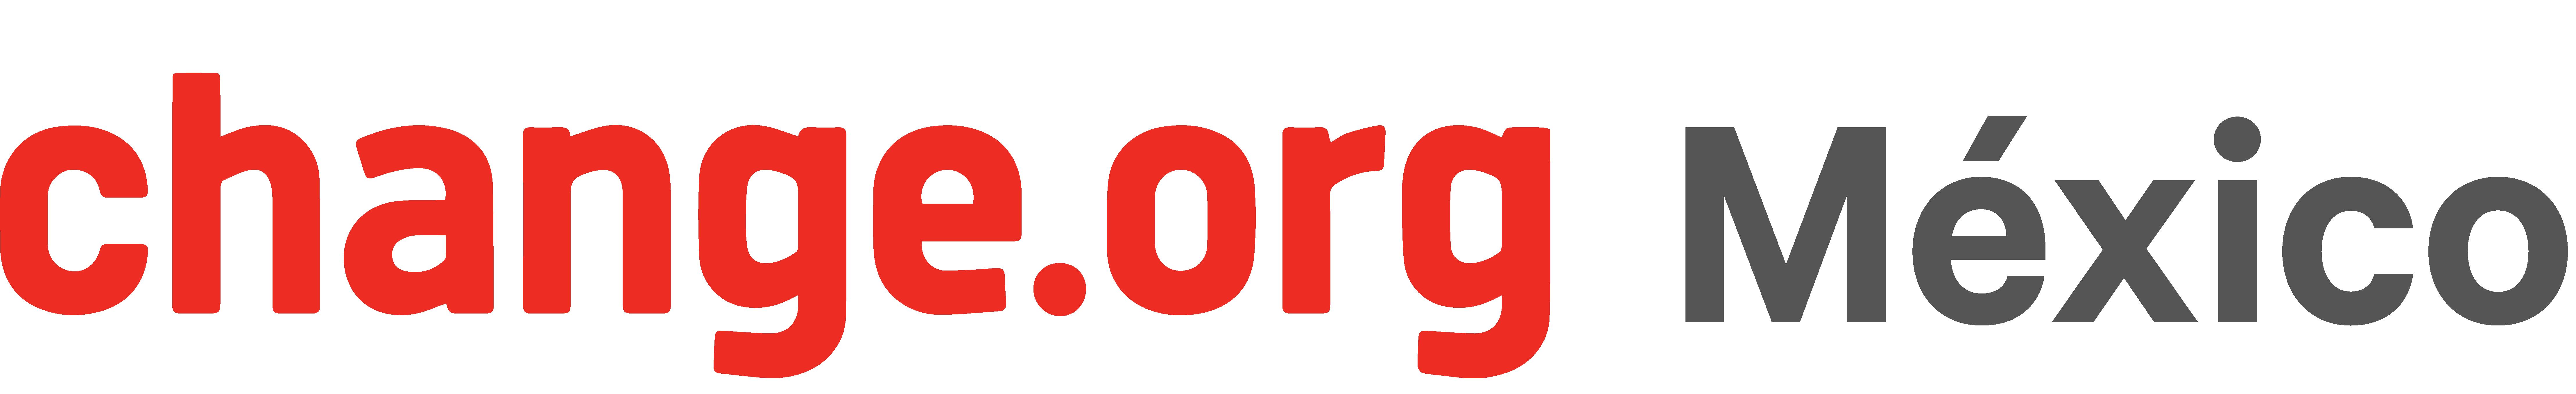 Change.org México